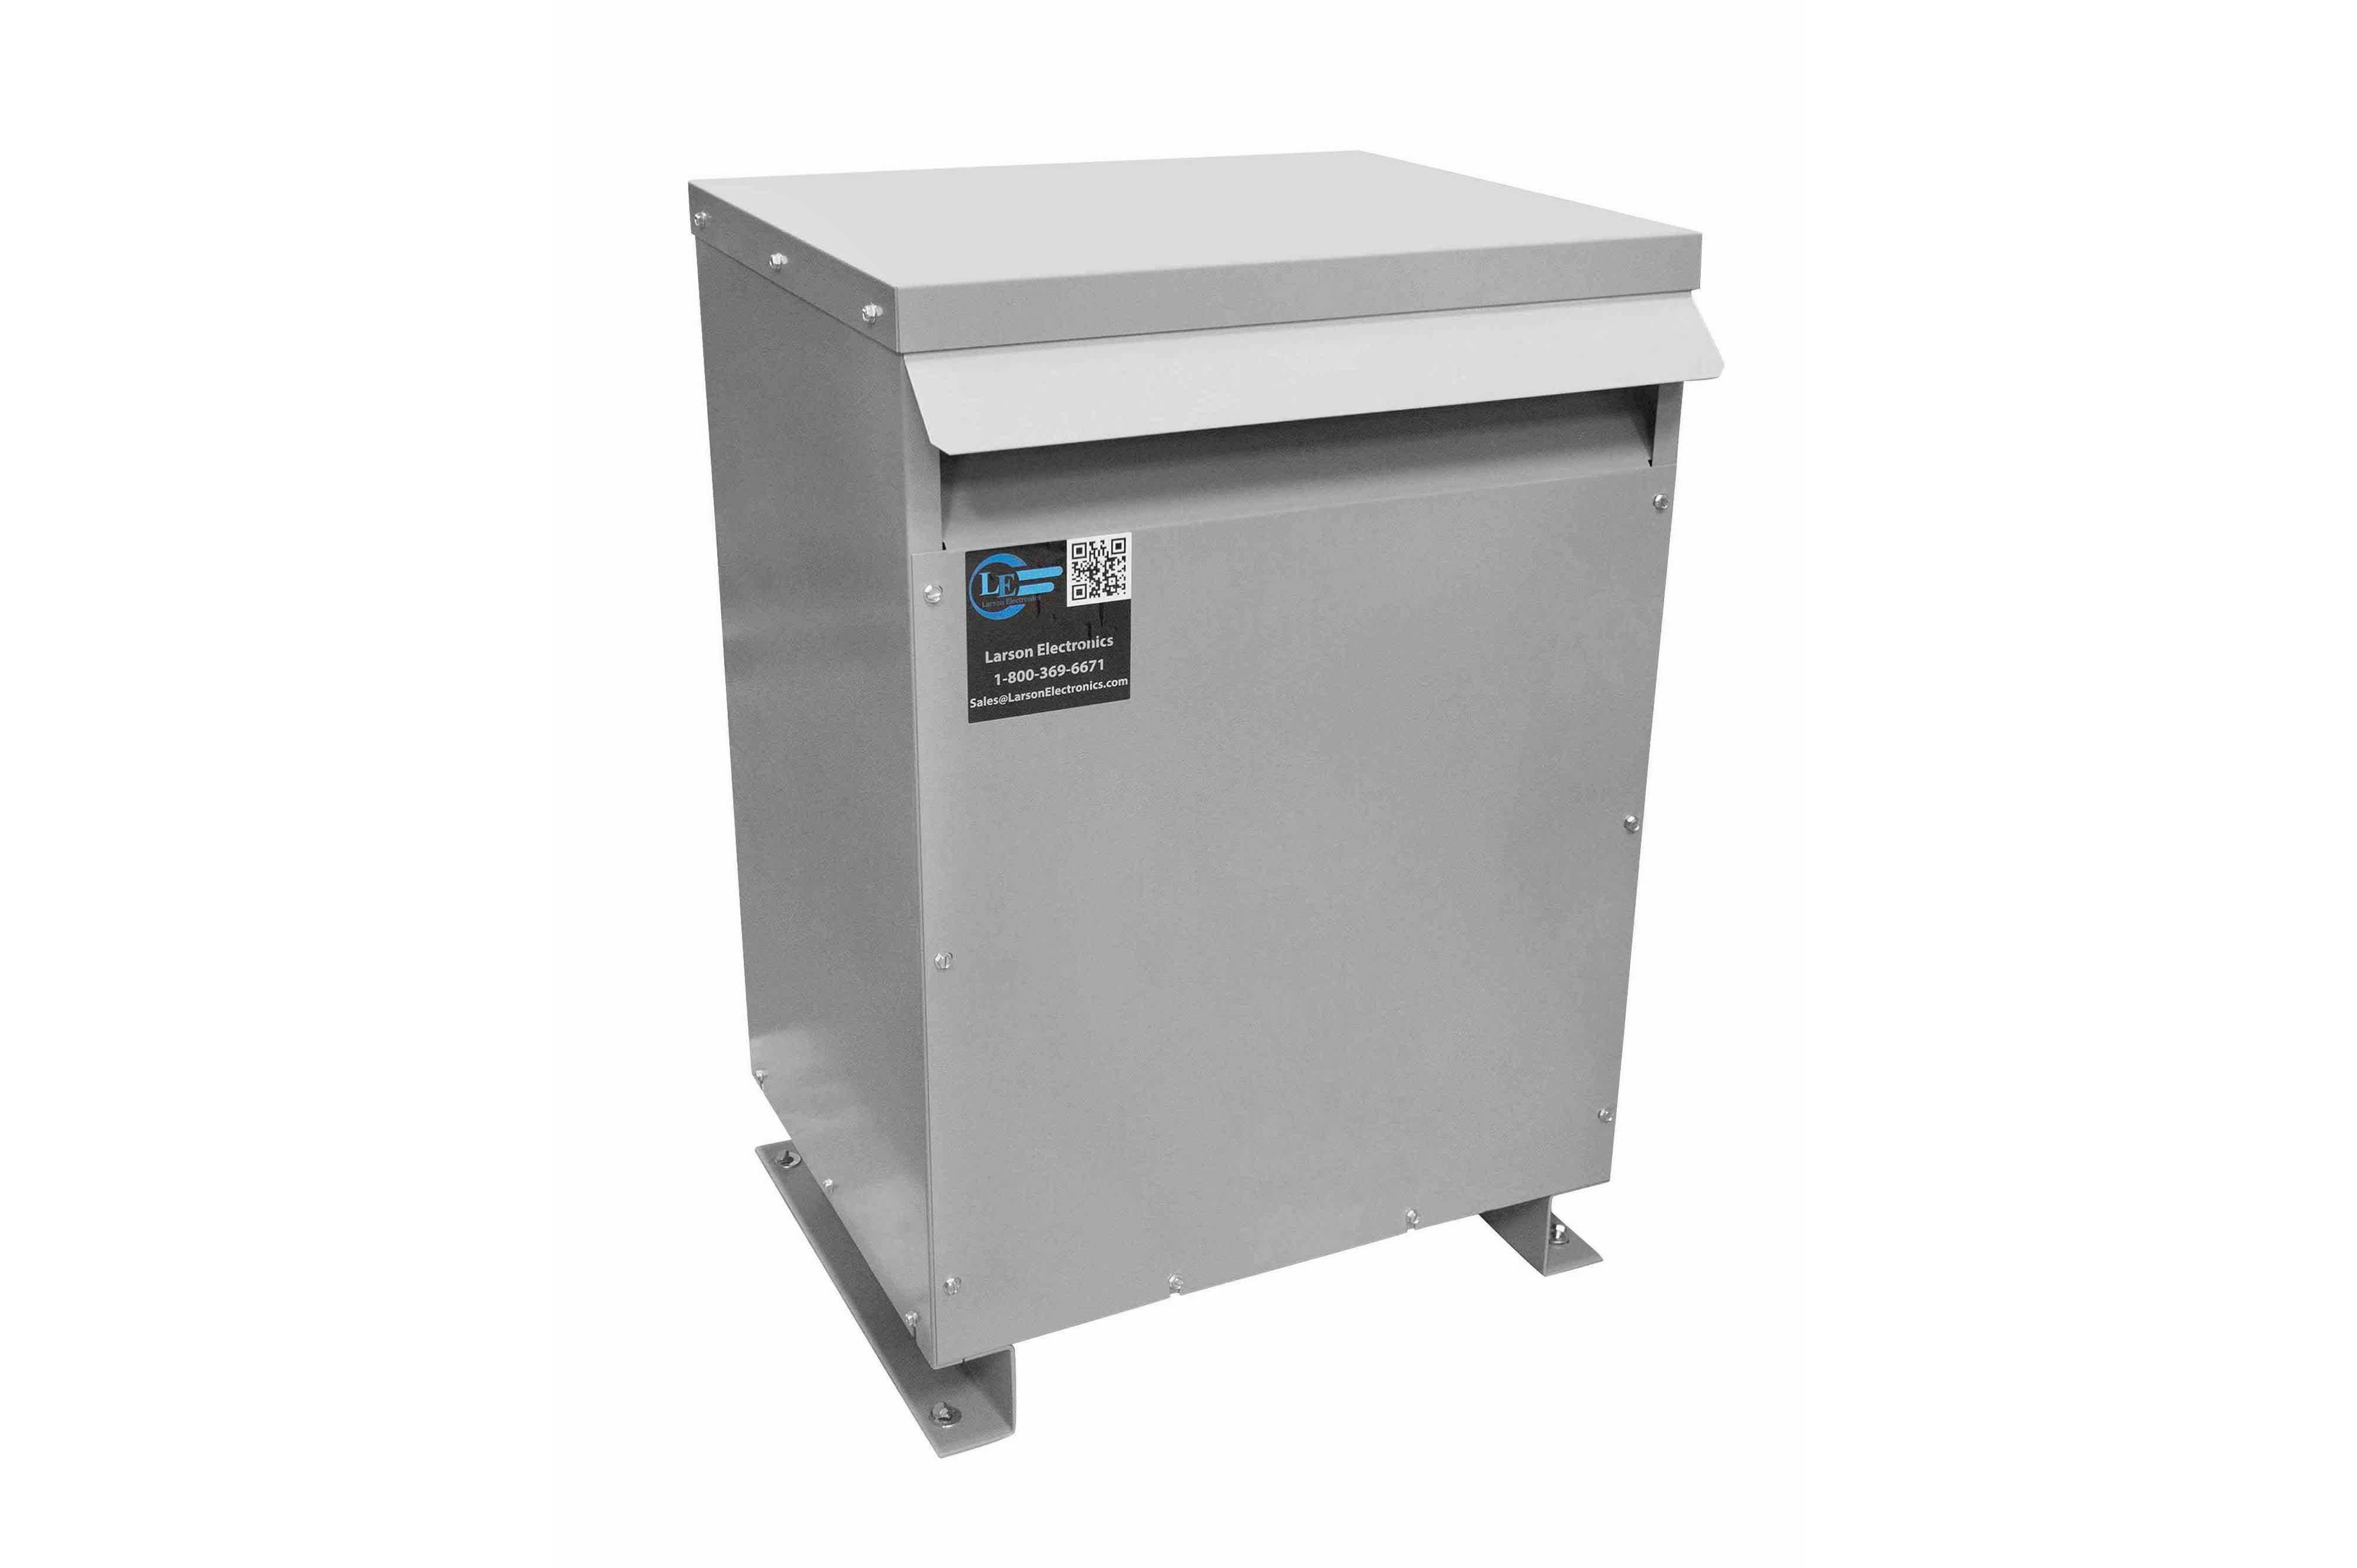 30 kVA 3PH Isolation Transformer, 380V Wye Primary, 480Y/277 Wye-N Secondary, N3R, Ventilated, 60 Hz